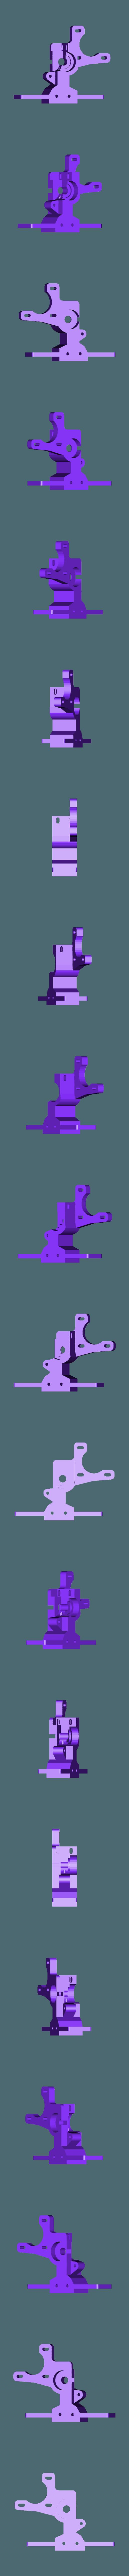 Soporte_Extrusor_Prusa_RichRap_V2.stl Download free STL file Soporte All-Metal HotEnd - J-Head - Quick-Fit • 3D printing design, fabrica3d